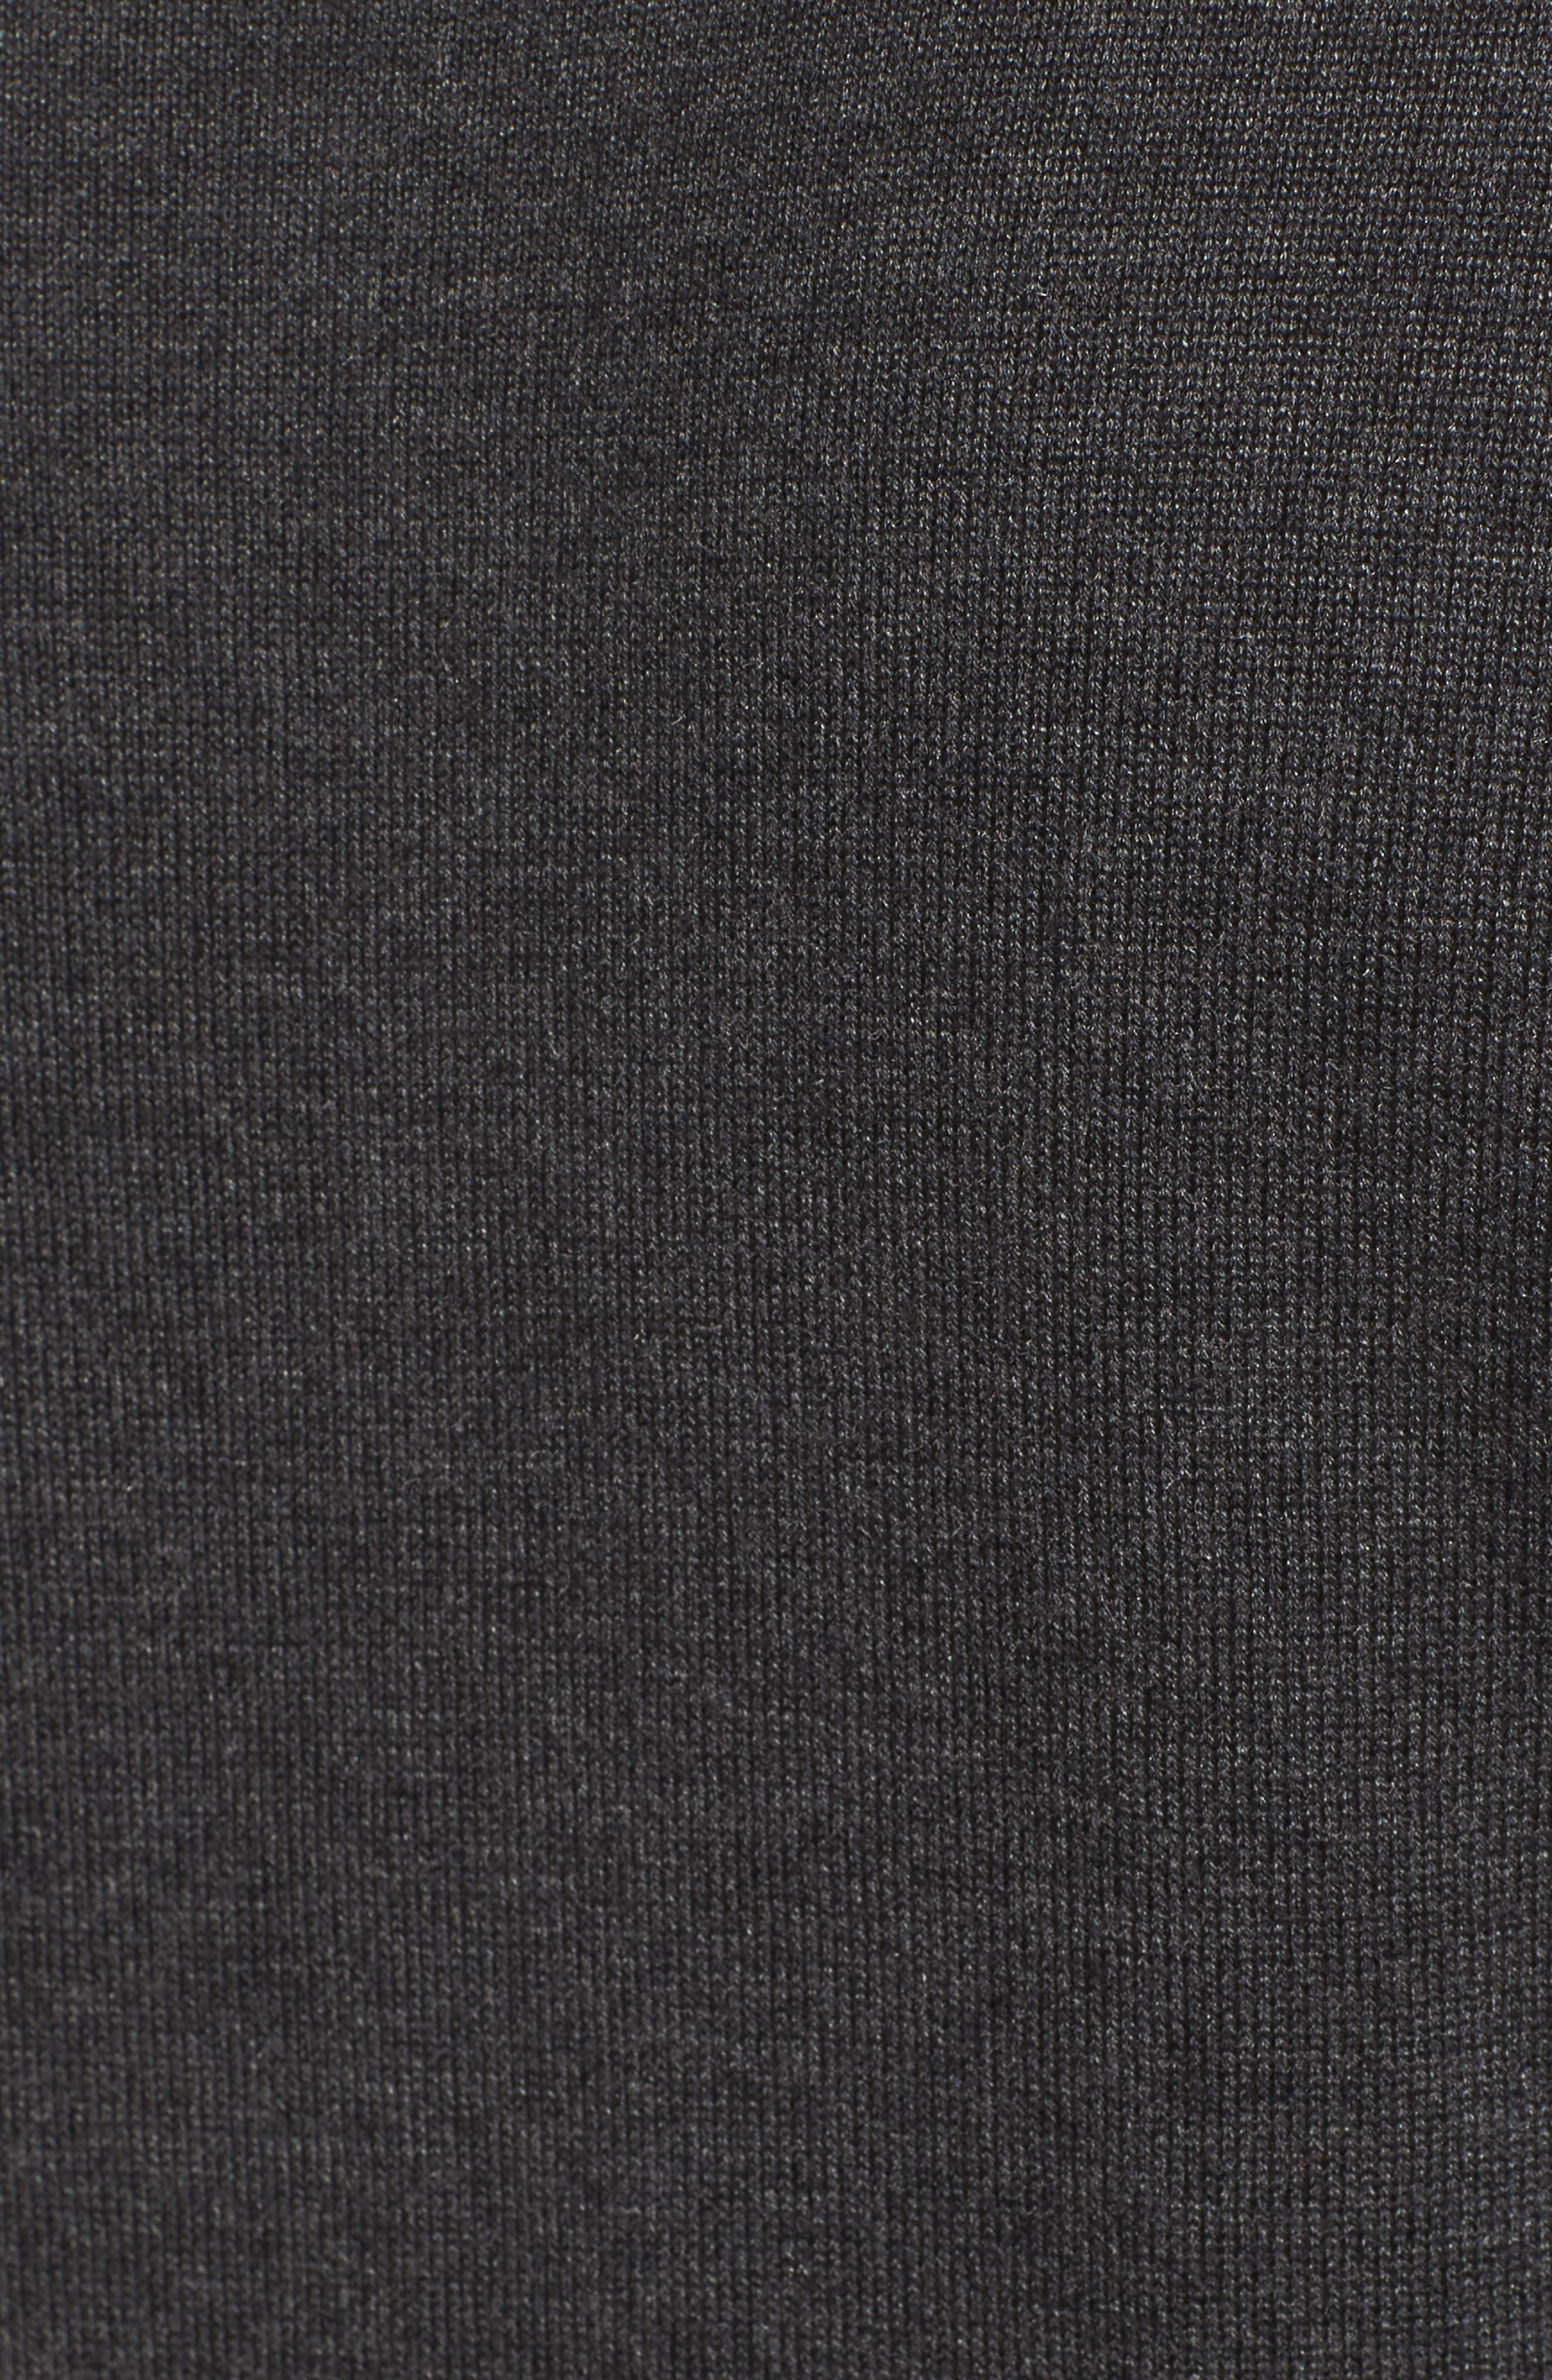 Bell Sleeve Choker Neck Sweater,                             Alternate thumbnail 22, color,